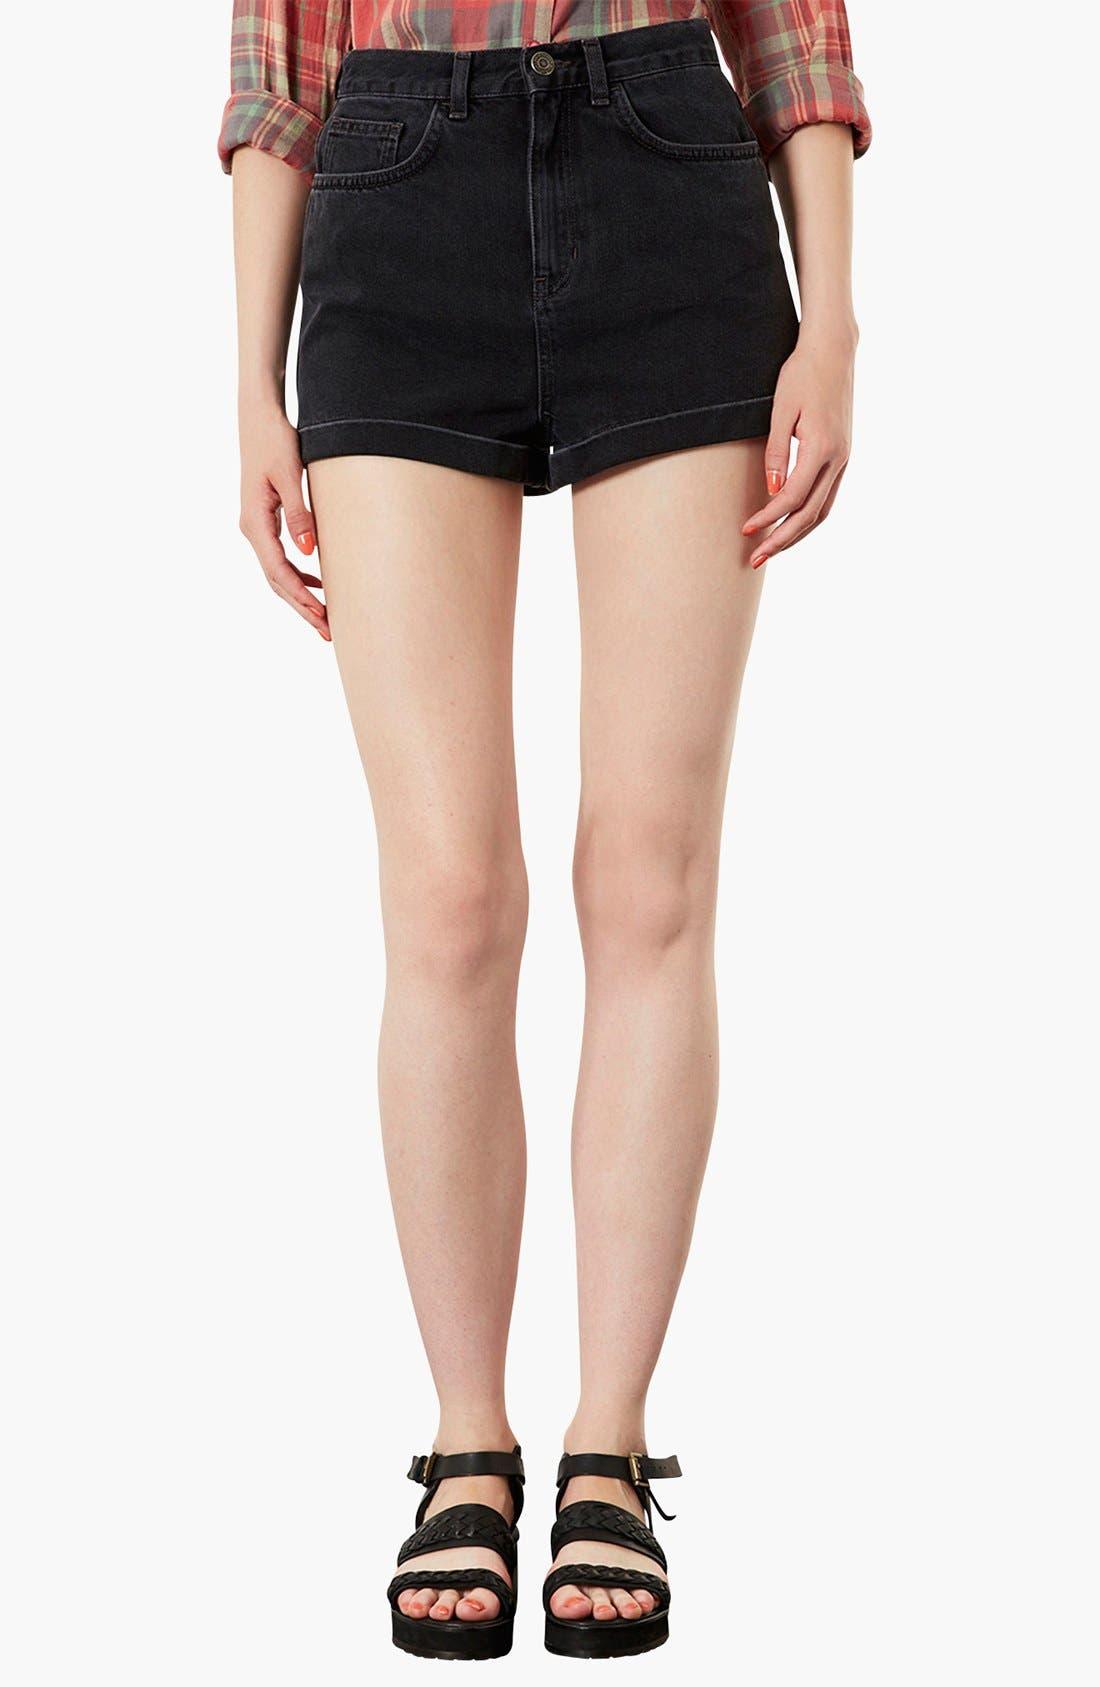 Alternate Image 1 Selected - Topshop Moto 'Mom' High Rise Denim Shorts (Black)